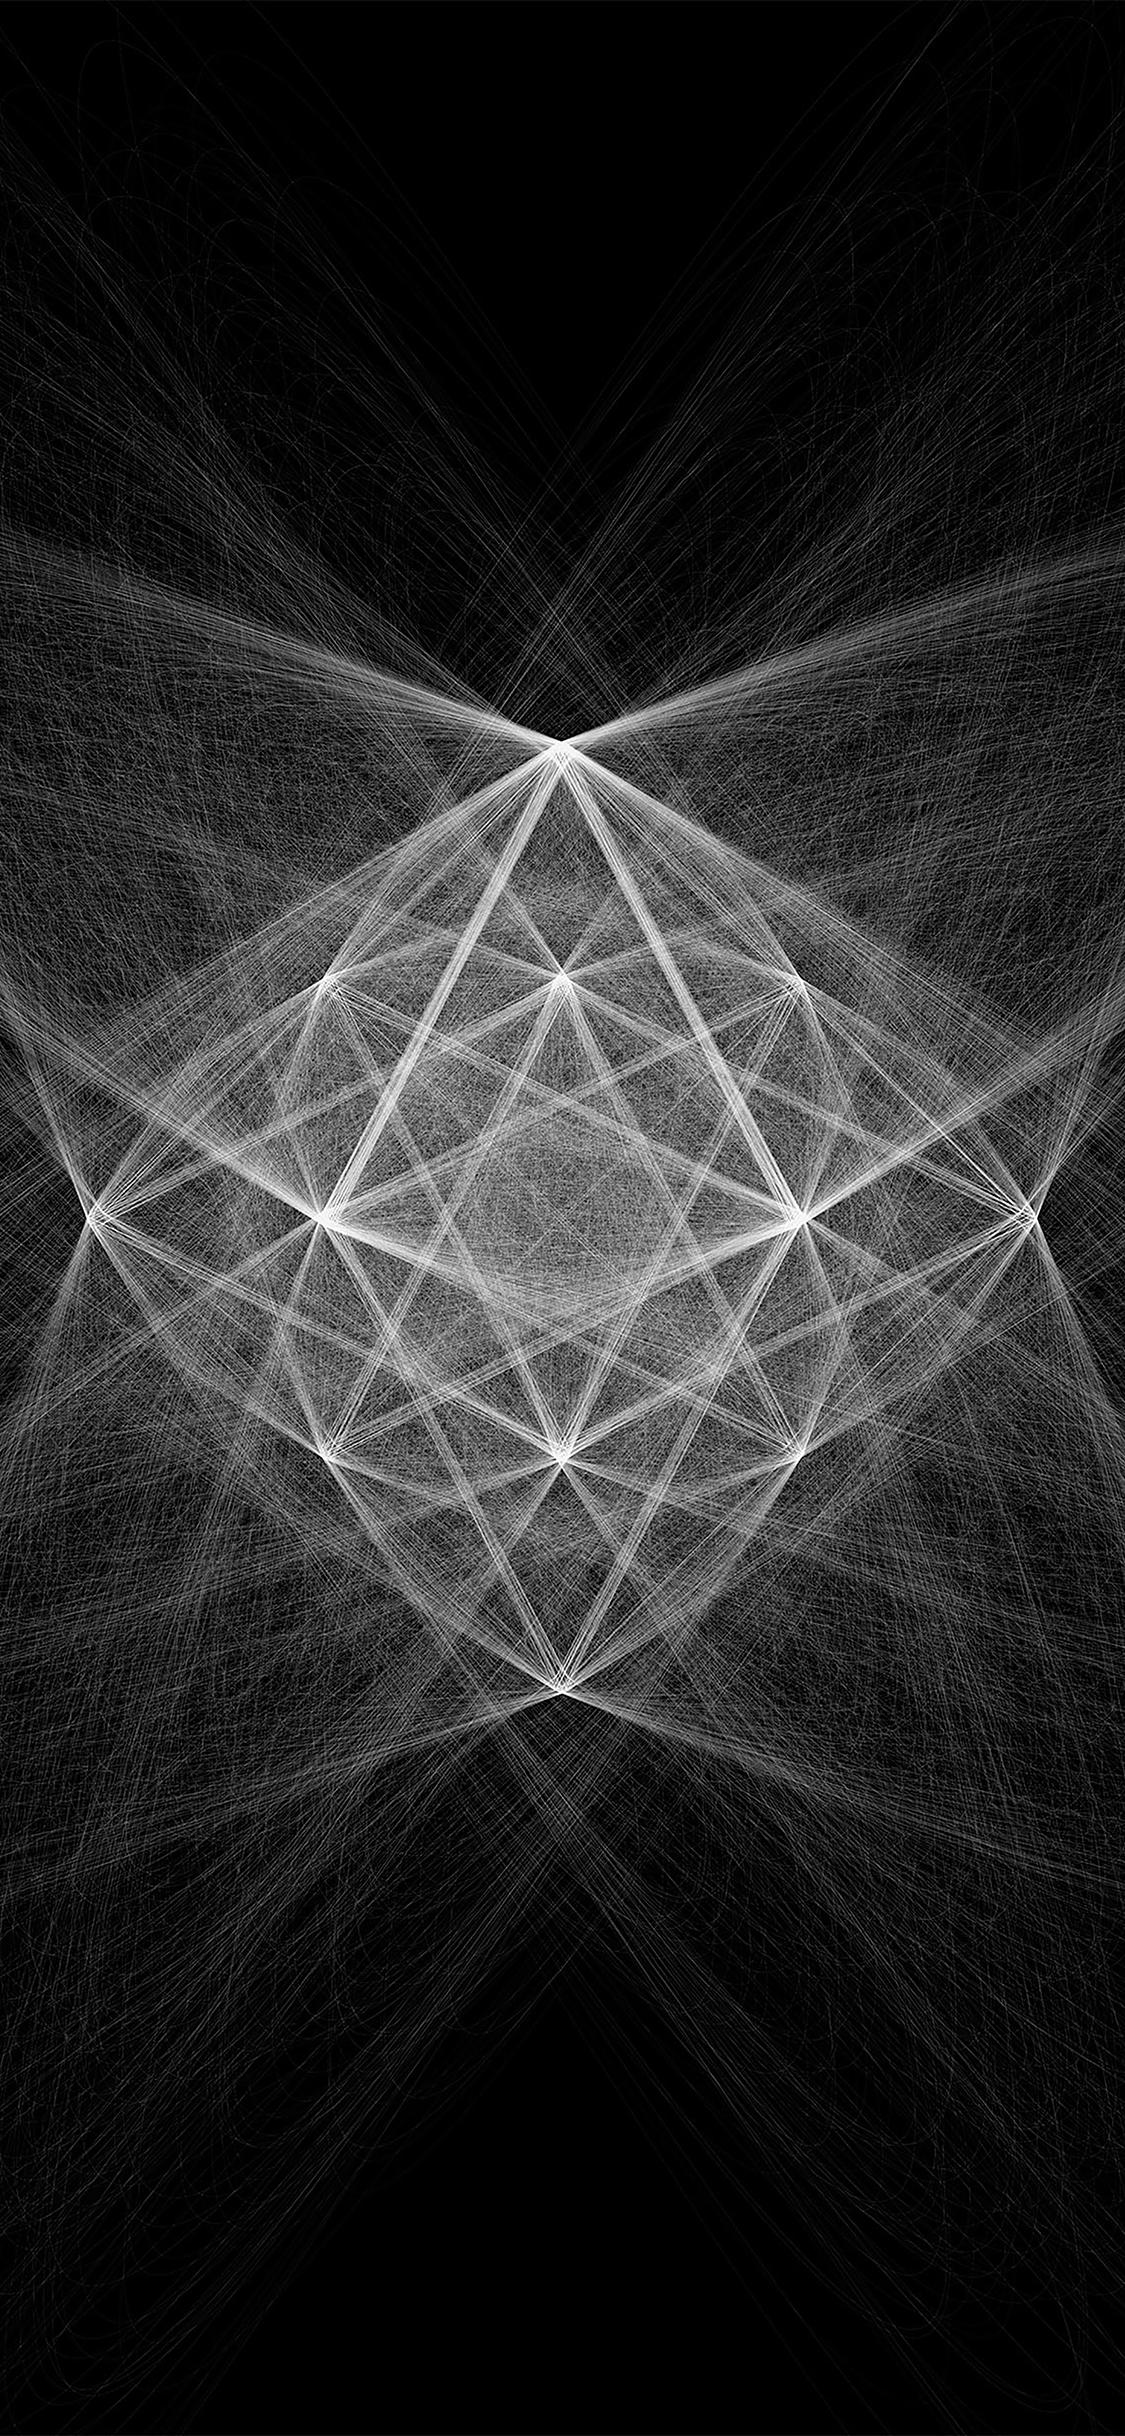 iPhoneXpapers.com-Apple-iPhone-wallpaper-va80-wallpaper-crystal-meth-pattern